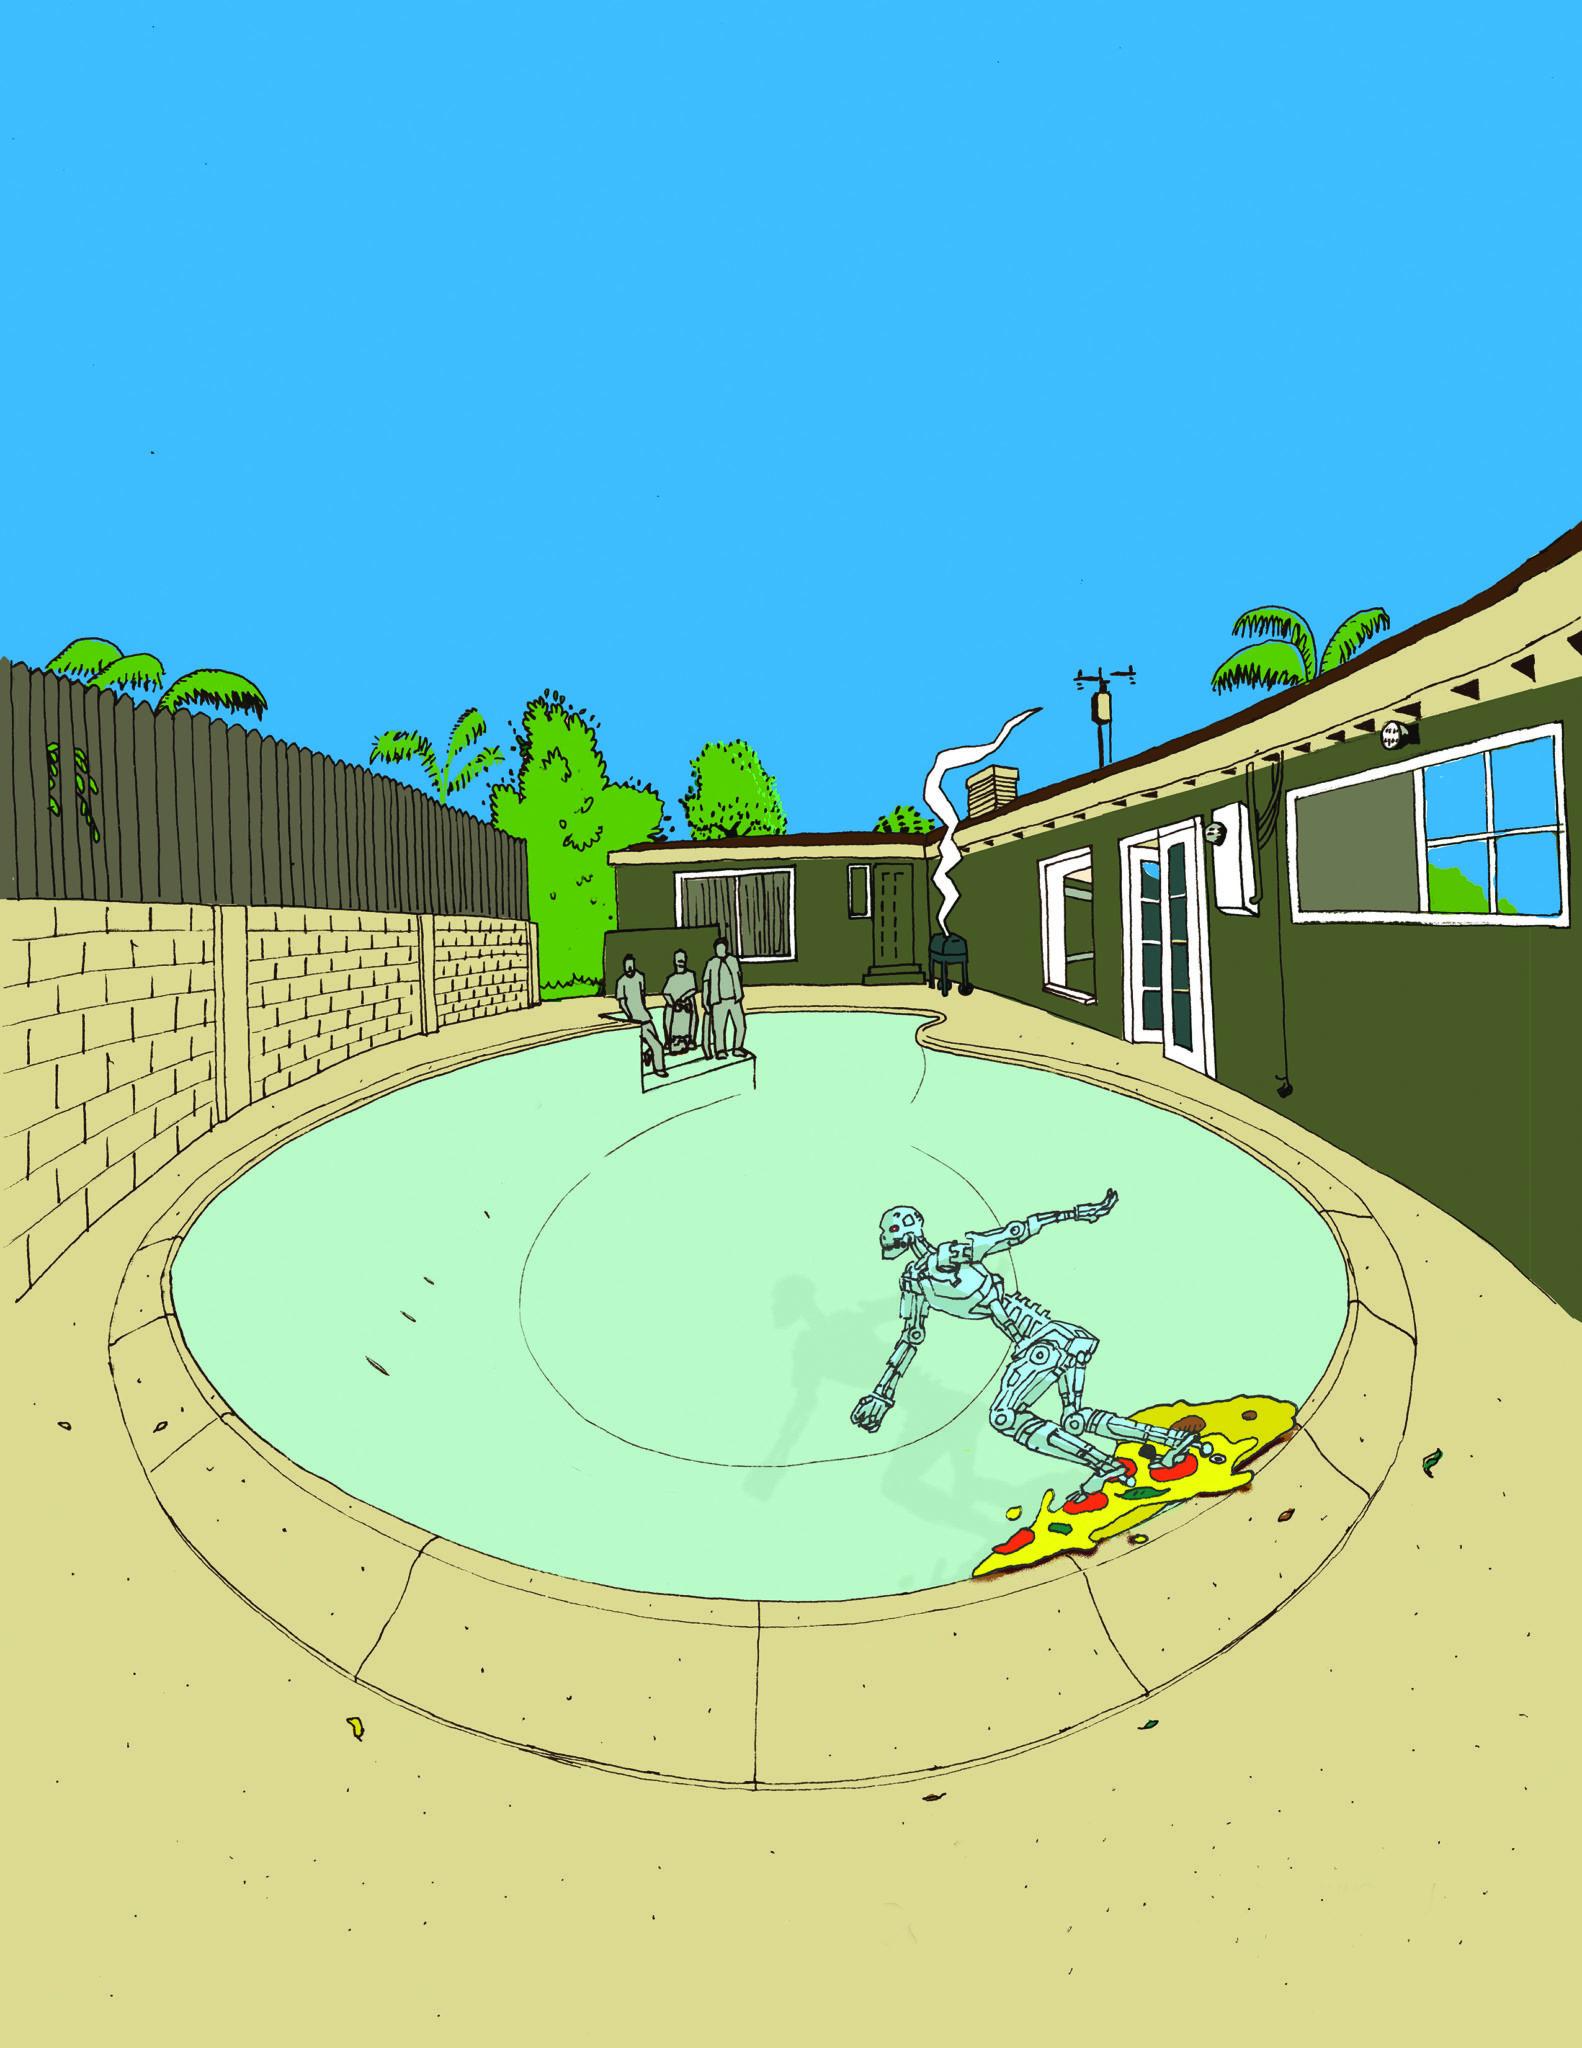 robots skateboarding